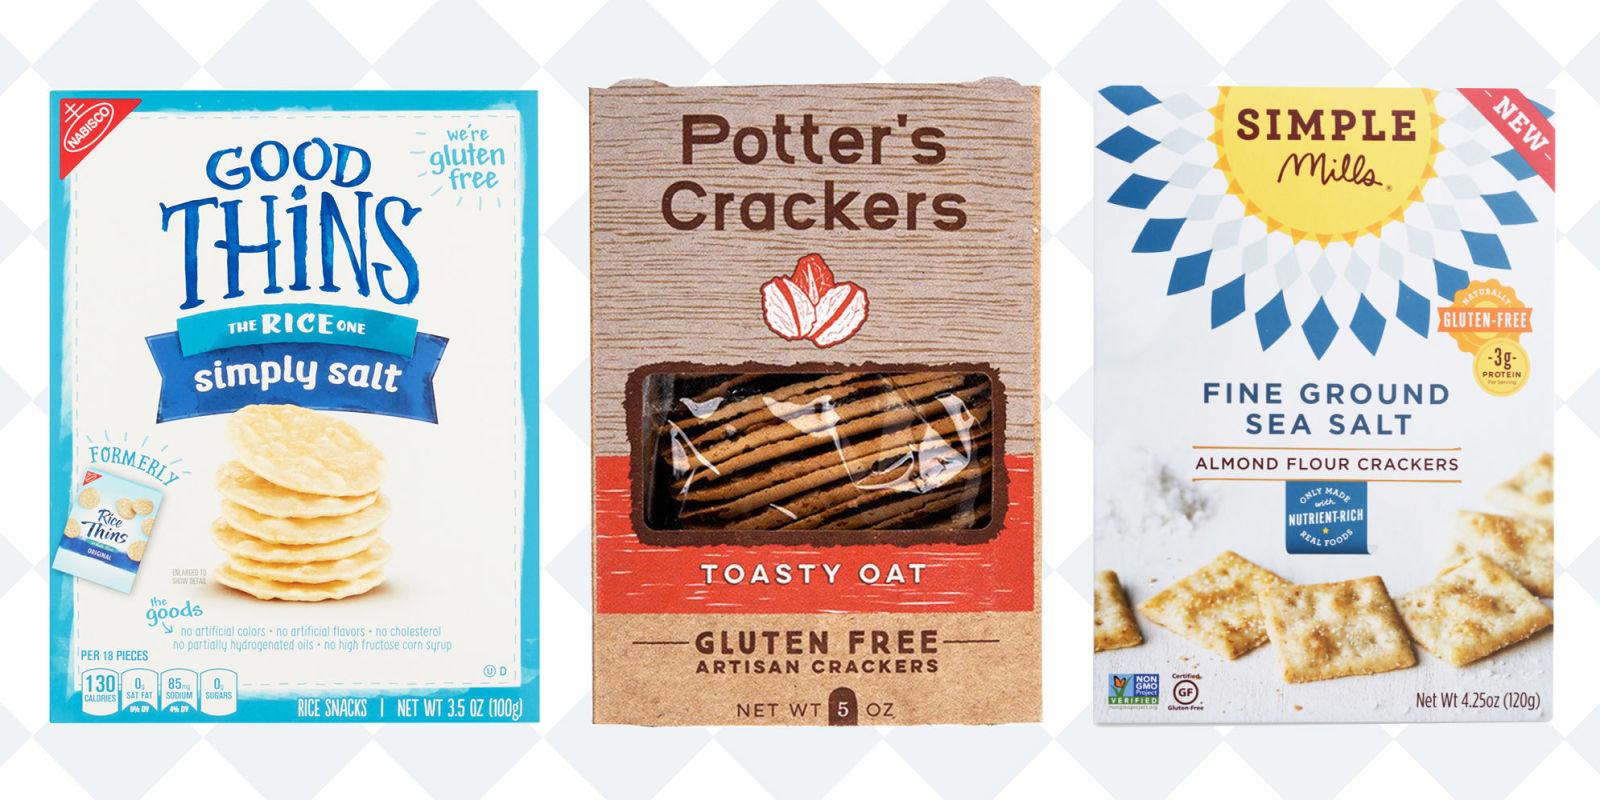 15 Best Gluten Free Crackers in 2018